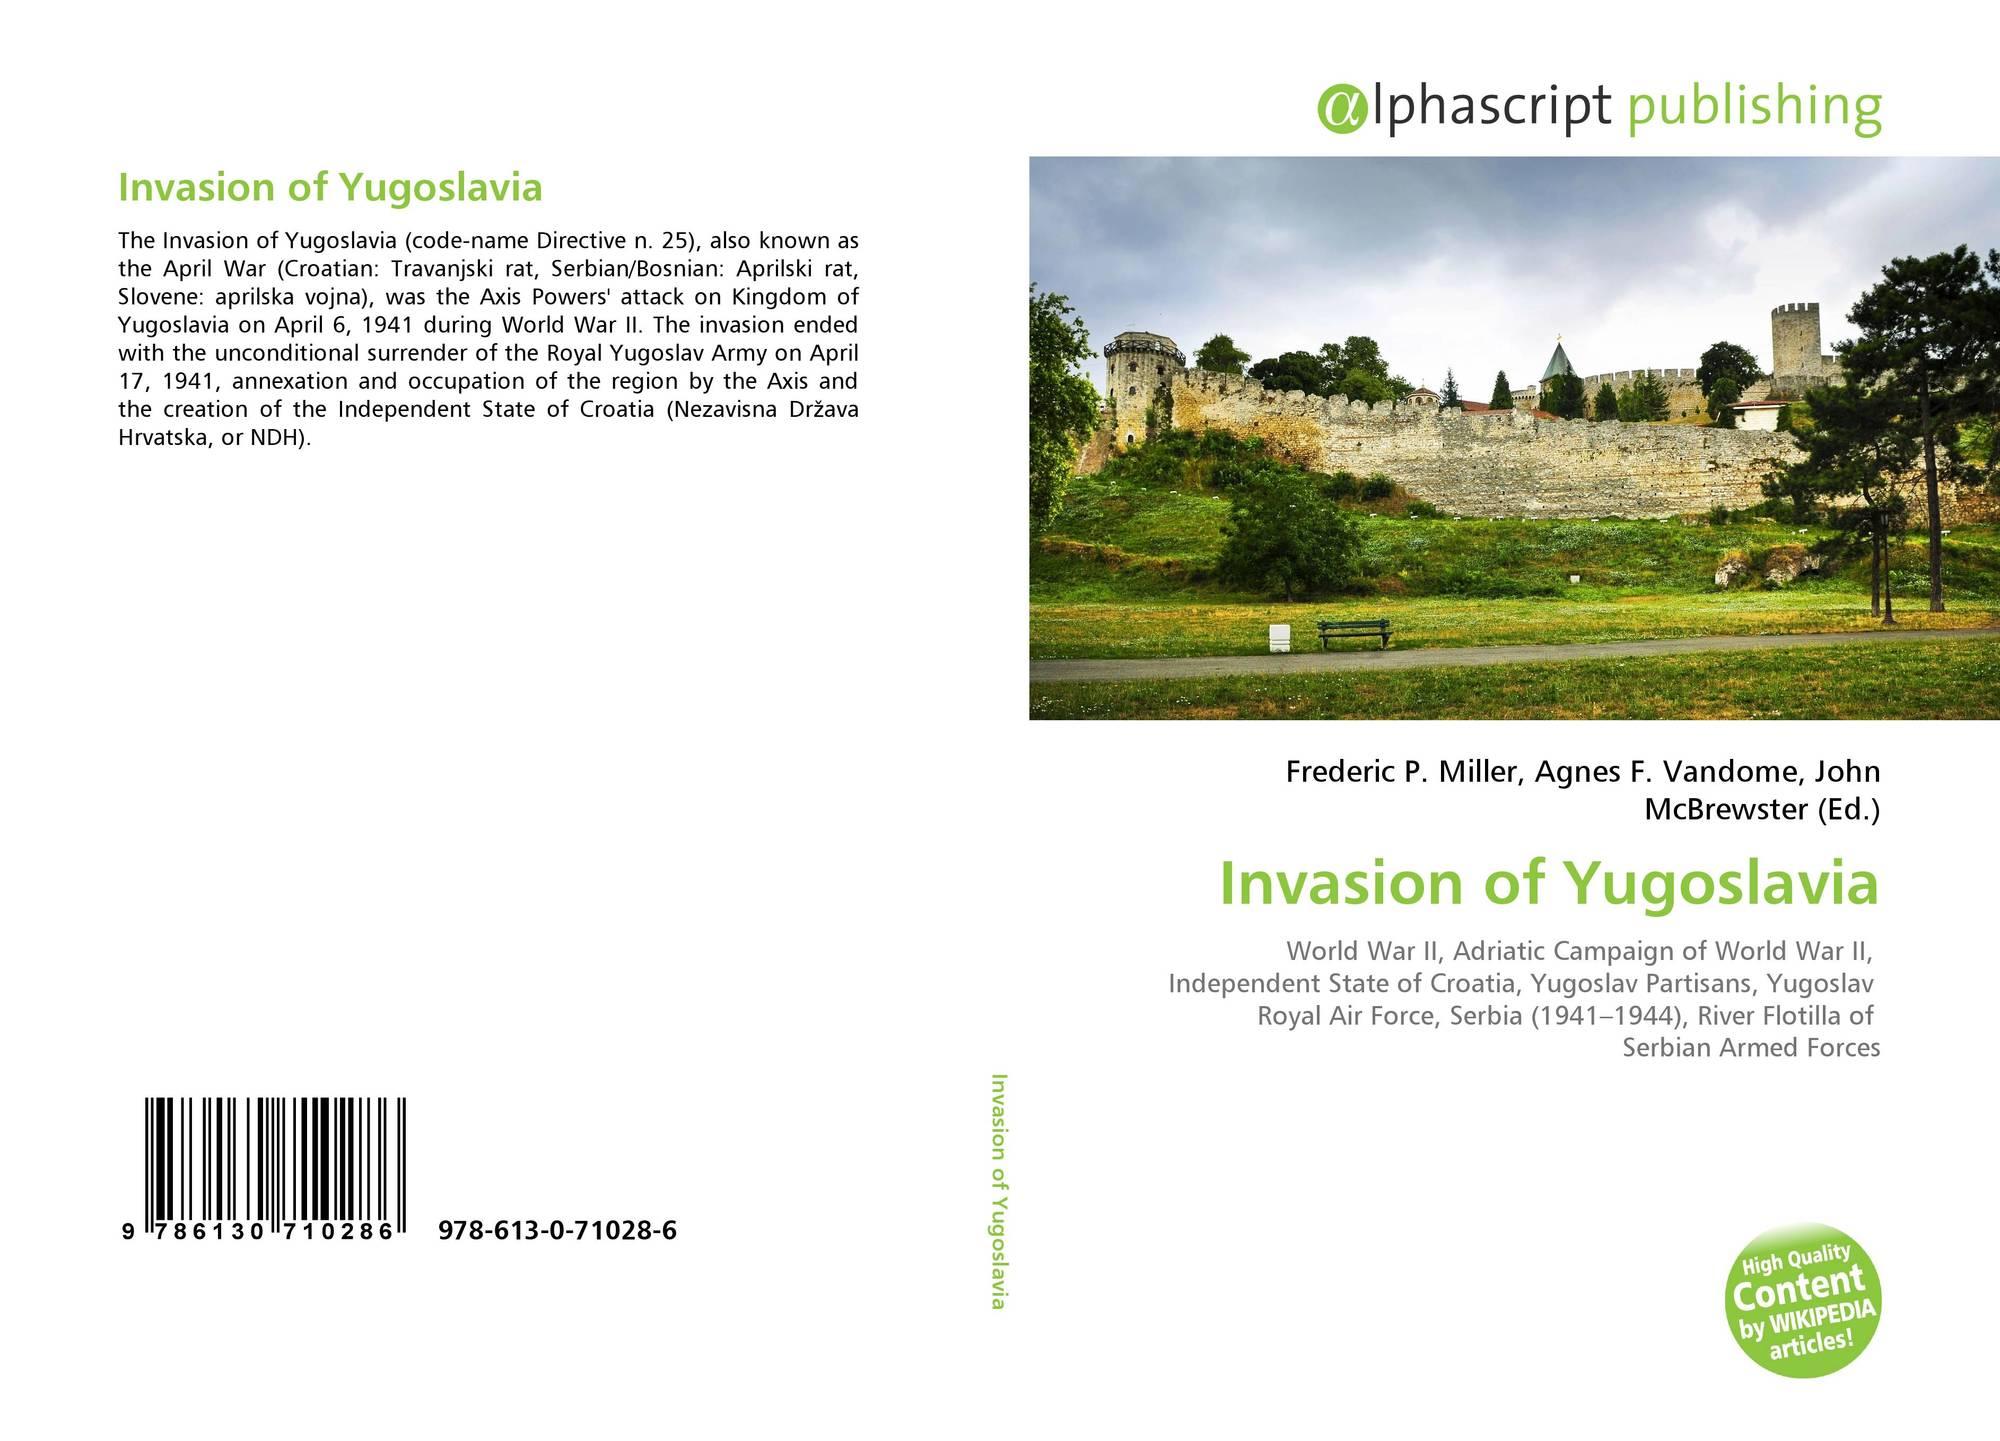 Bookcover of Invasion of Yugoslavia. Omni badge 9307e2201e5f762643a64561af3456be64a87707602f96b92ef18a9bbcada116